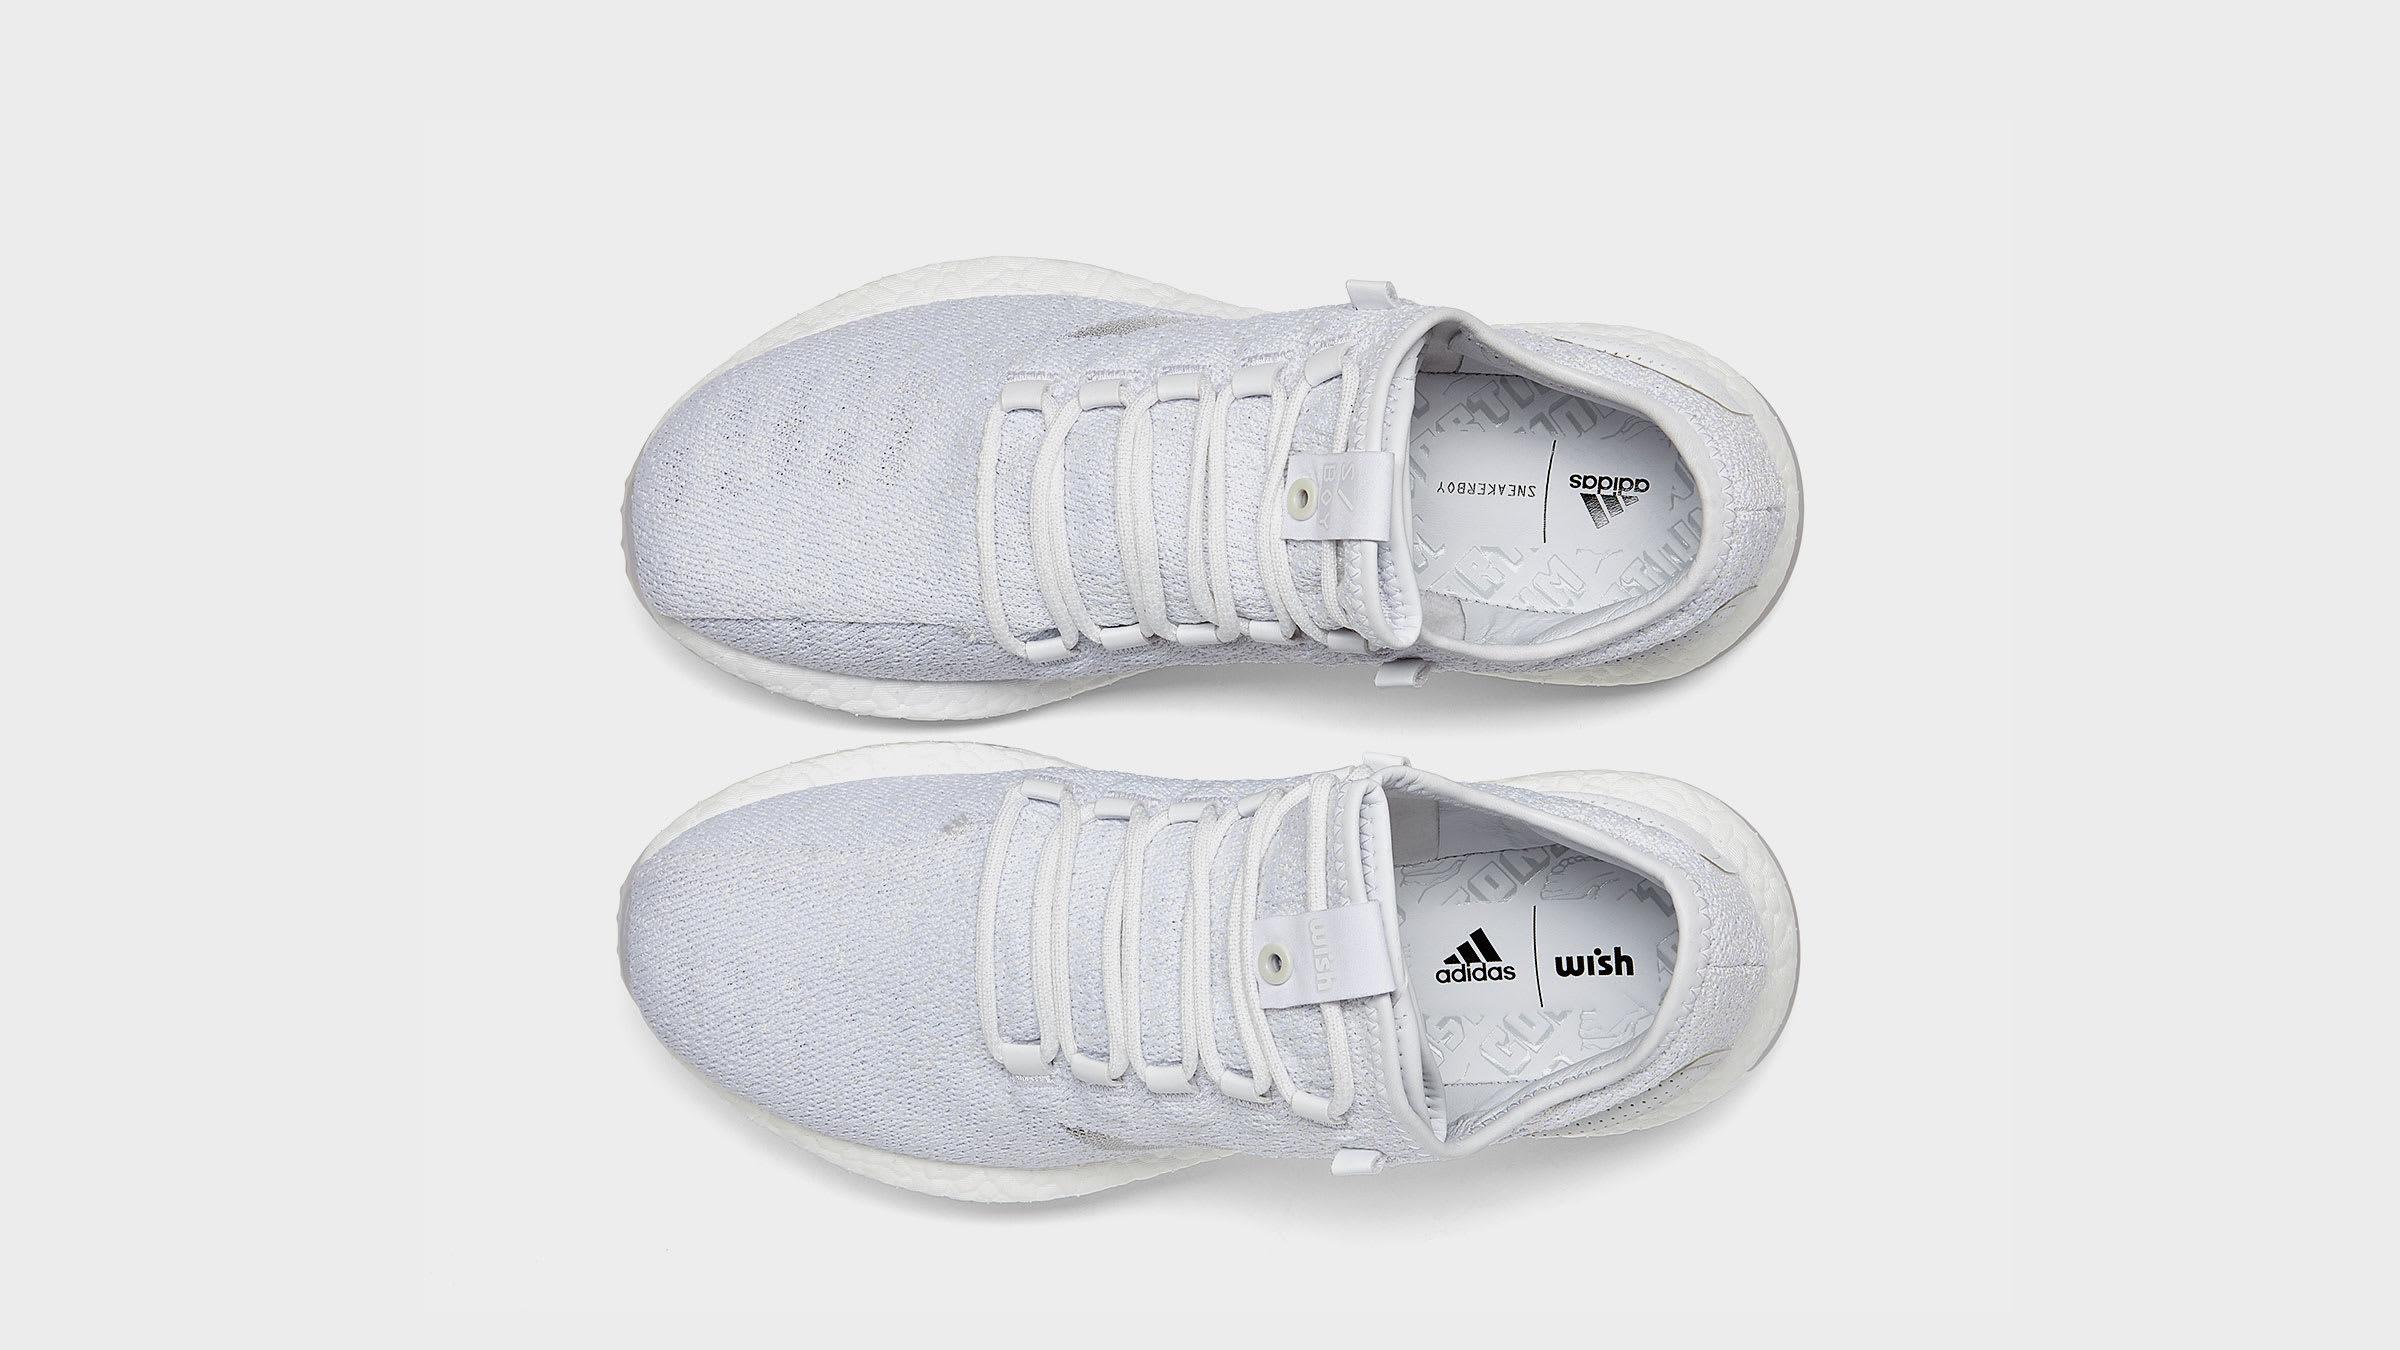 b31954569cb4f Adidas x Sneaker Boy x Wish PureBoost White